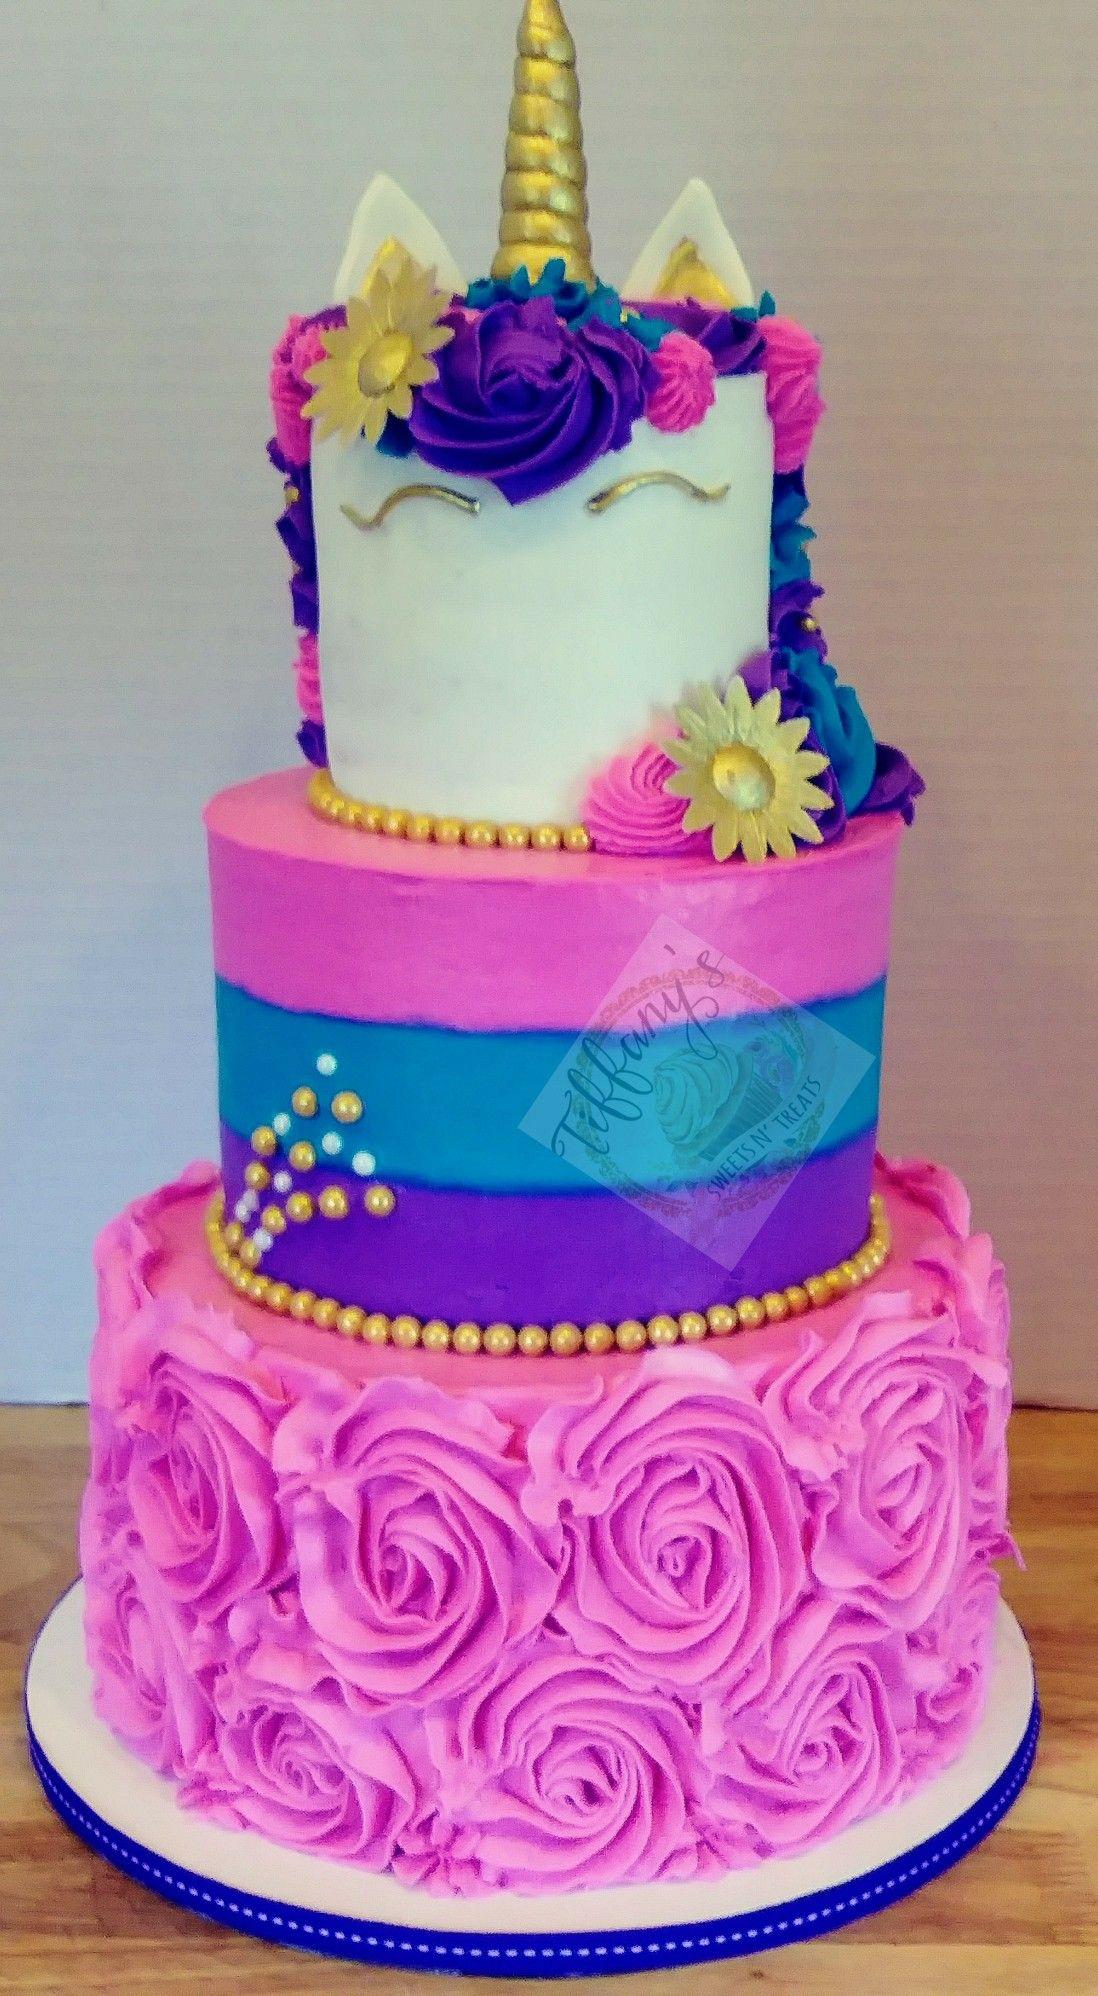 Unicorn Birthday Cake 3 Tier Buttercream Unicorn Cake